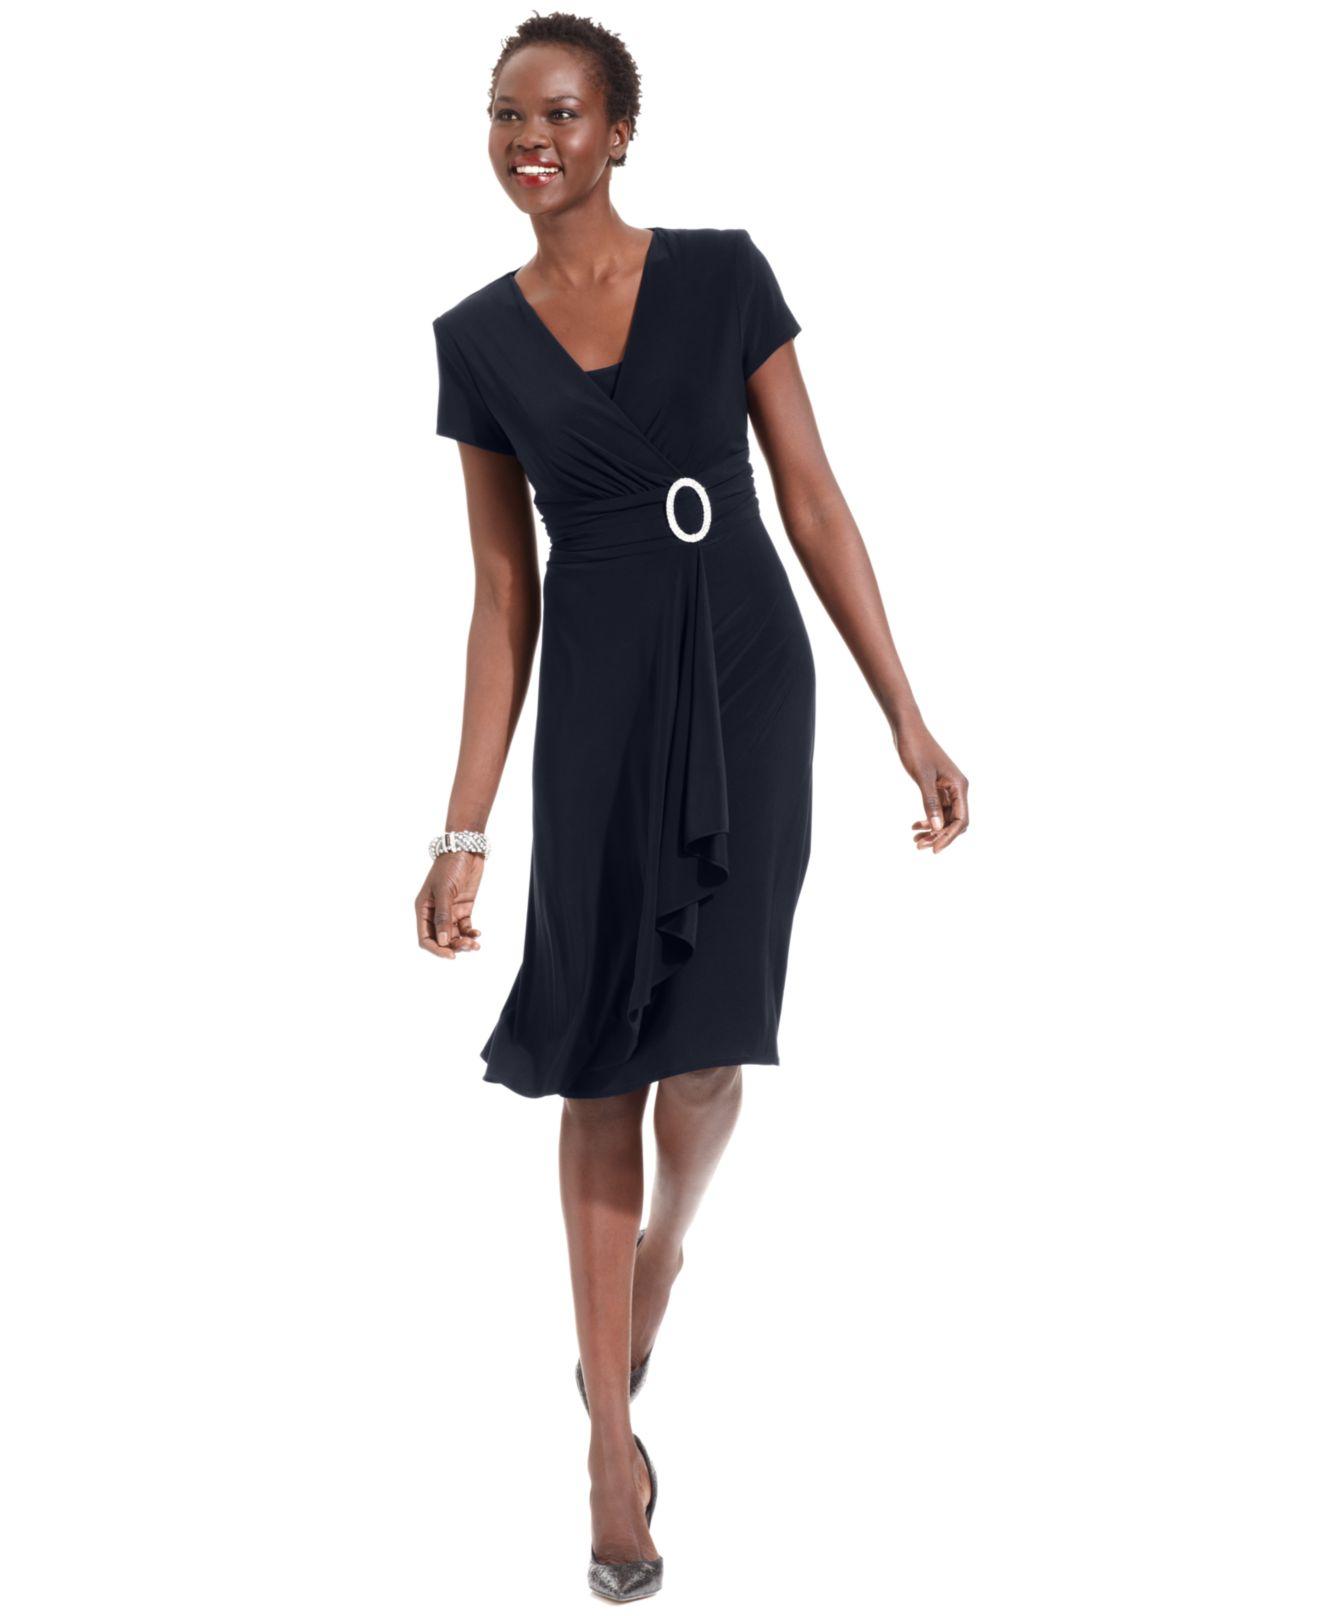 Macys Navy Blue Dresses: R & M Richards Dress, Short-sleeve Faux-wrap In Blue